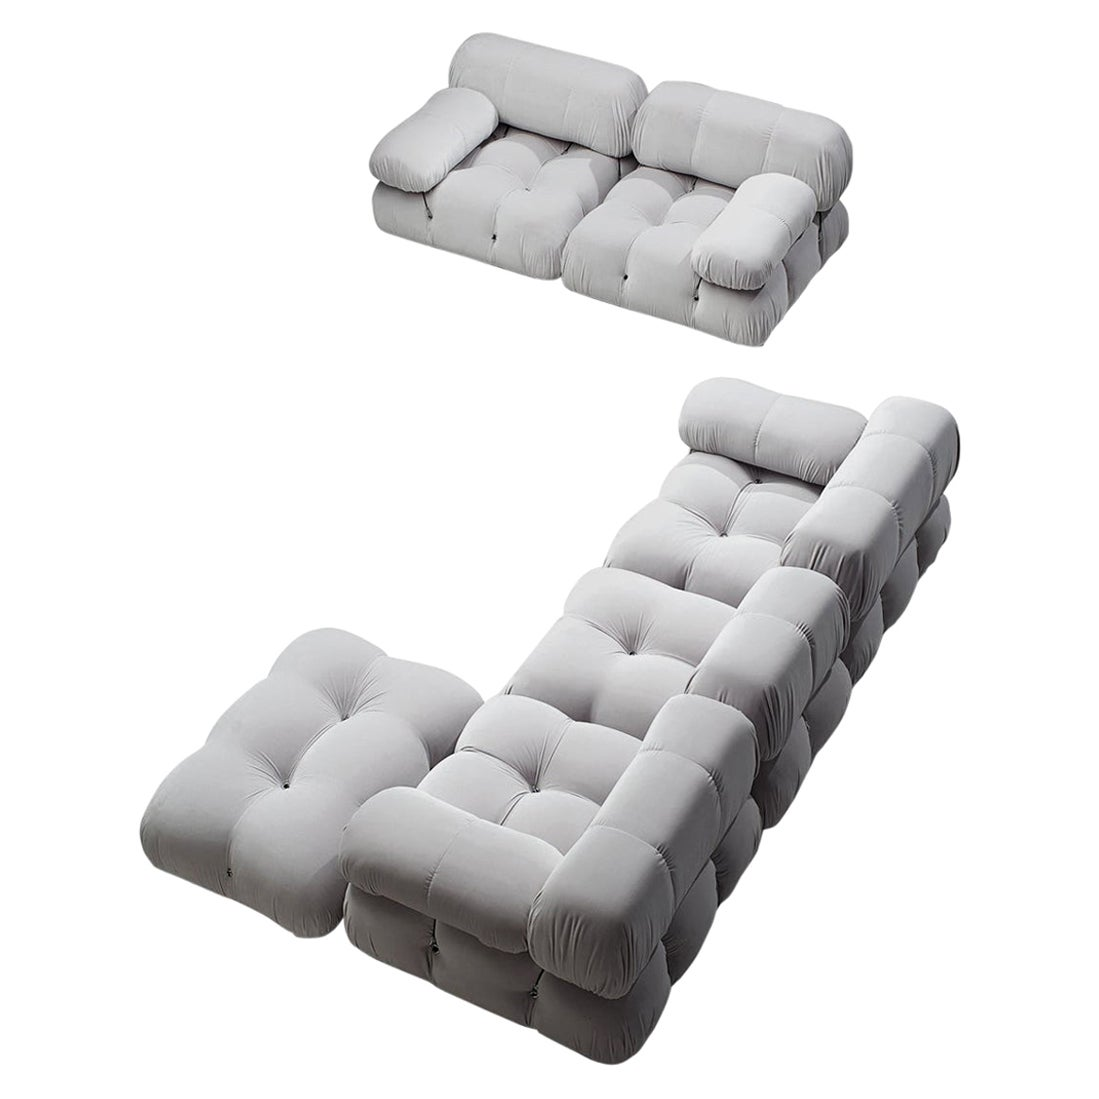 Mario Bellini Camaleonda Modular Sofa Reupholstered in Ice Grey Velvet